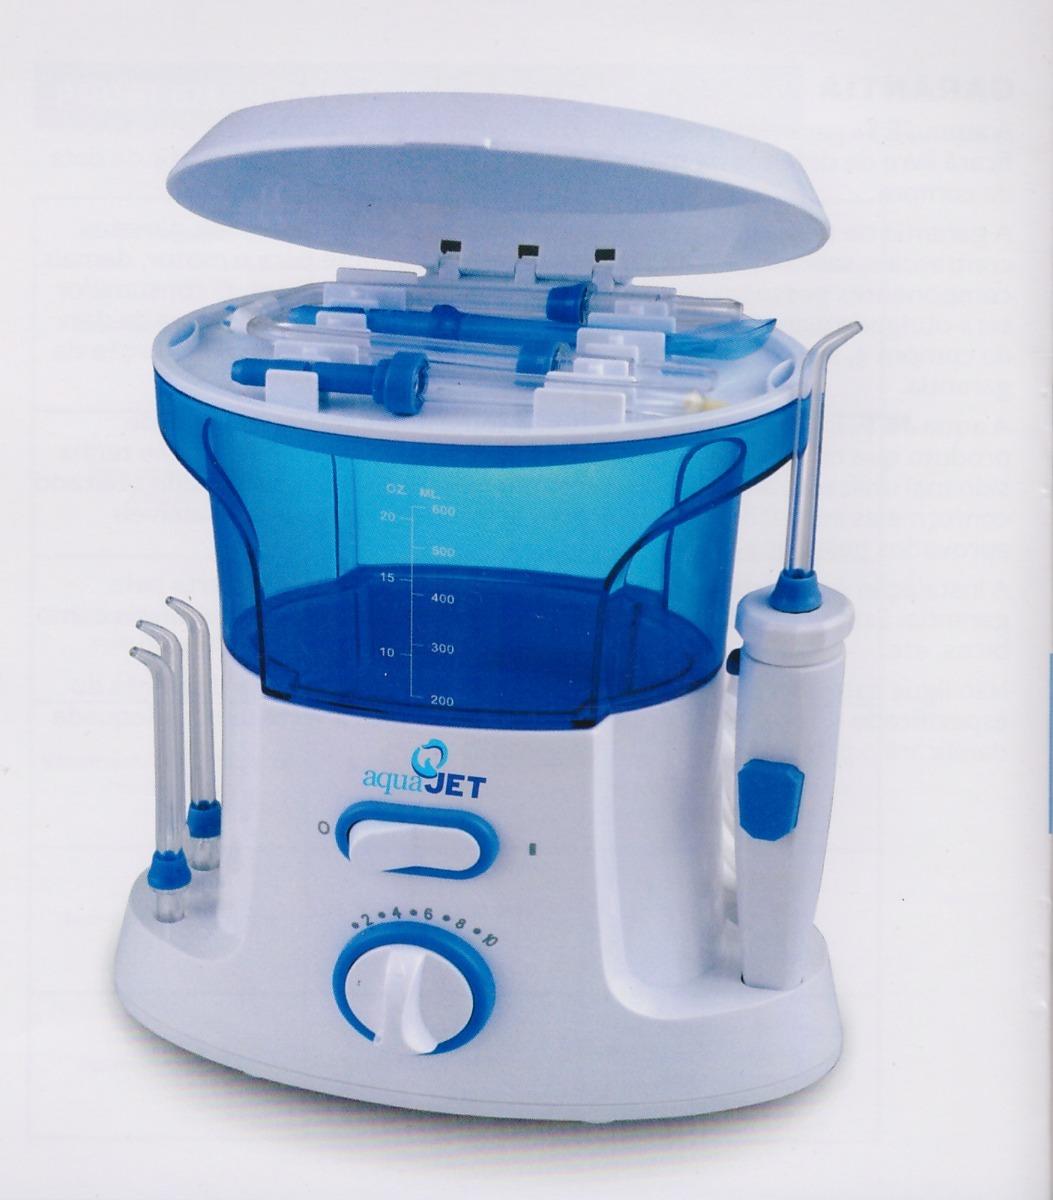 9436d015d Irrigador Oral Aquajet Fio Dental Jato De Água 11 Bicos - R  299